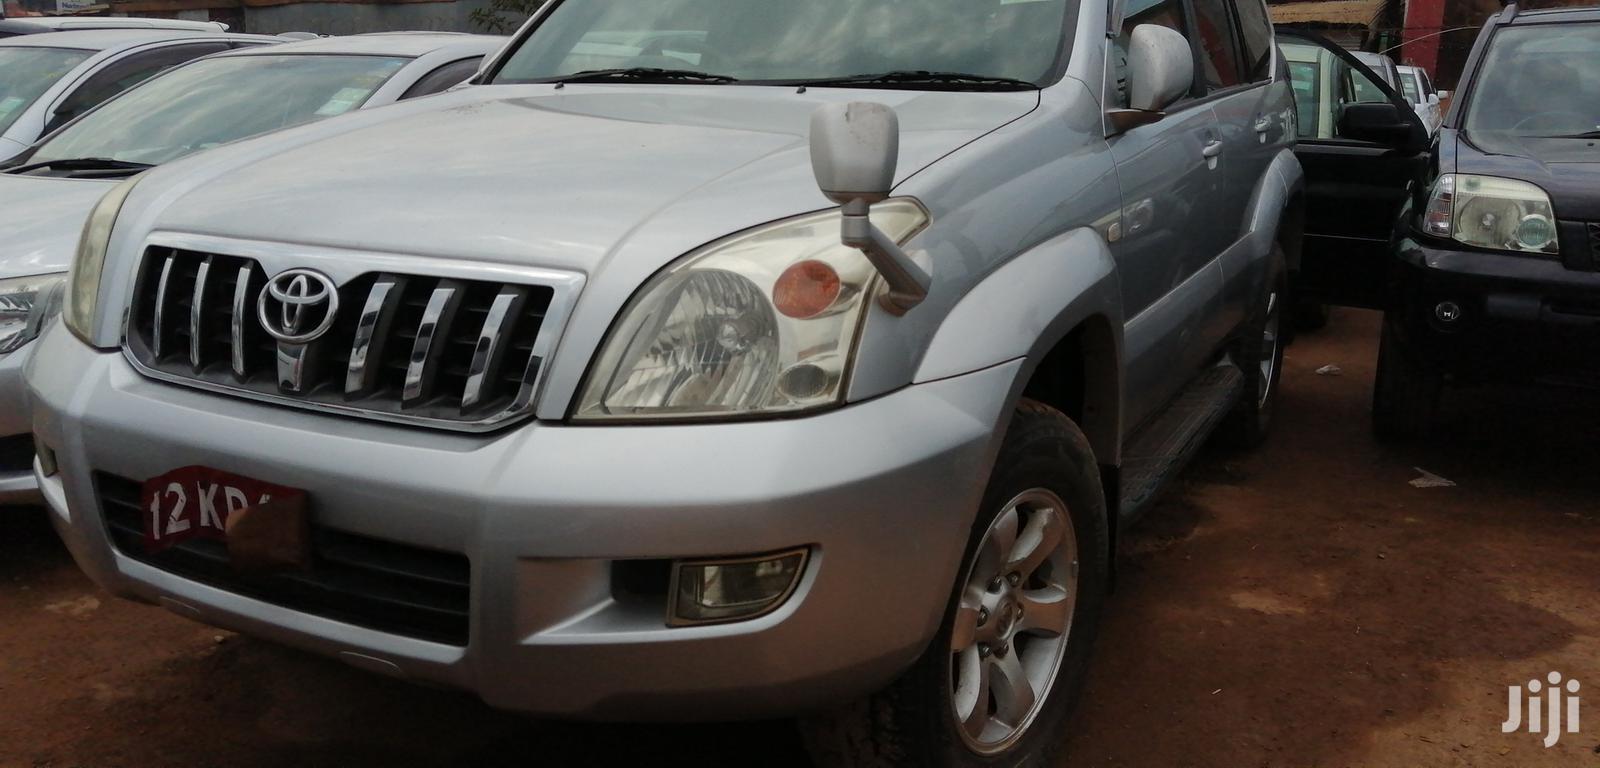 Archive: Toyota Land Cruiser Prado 2007 GXL Silver